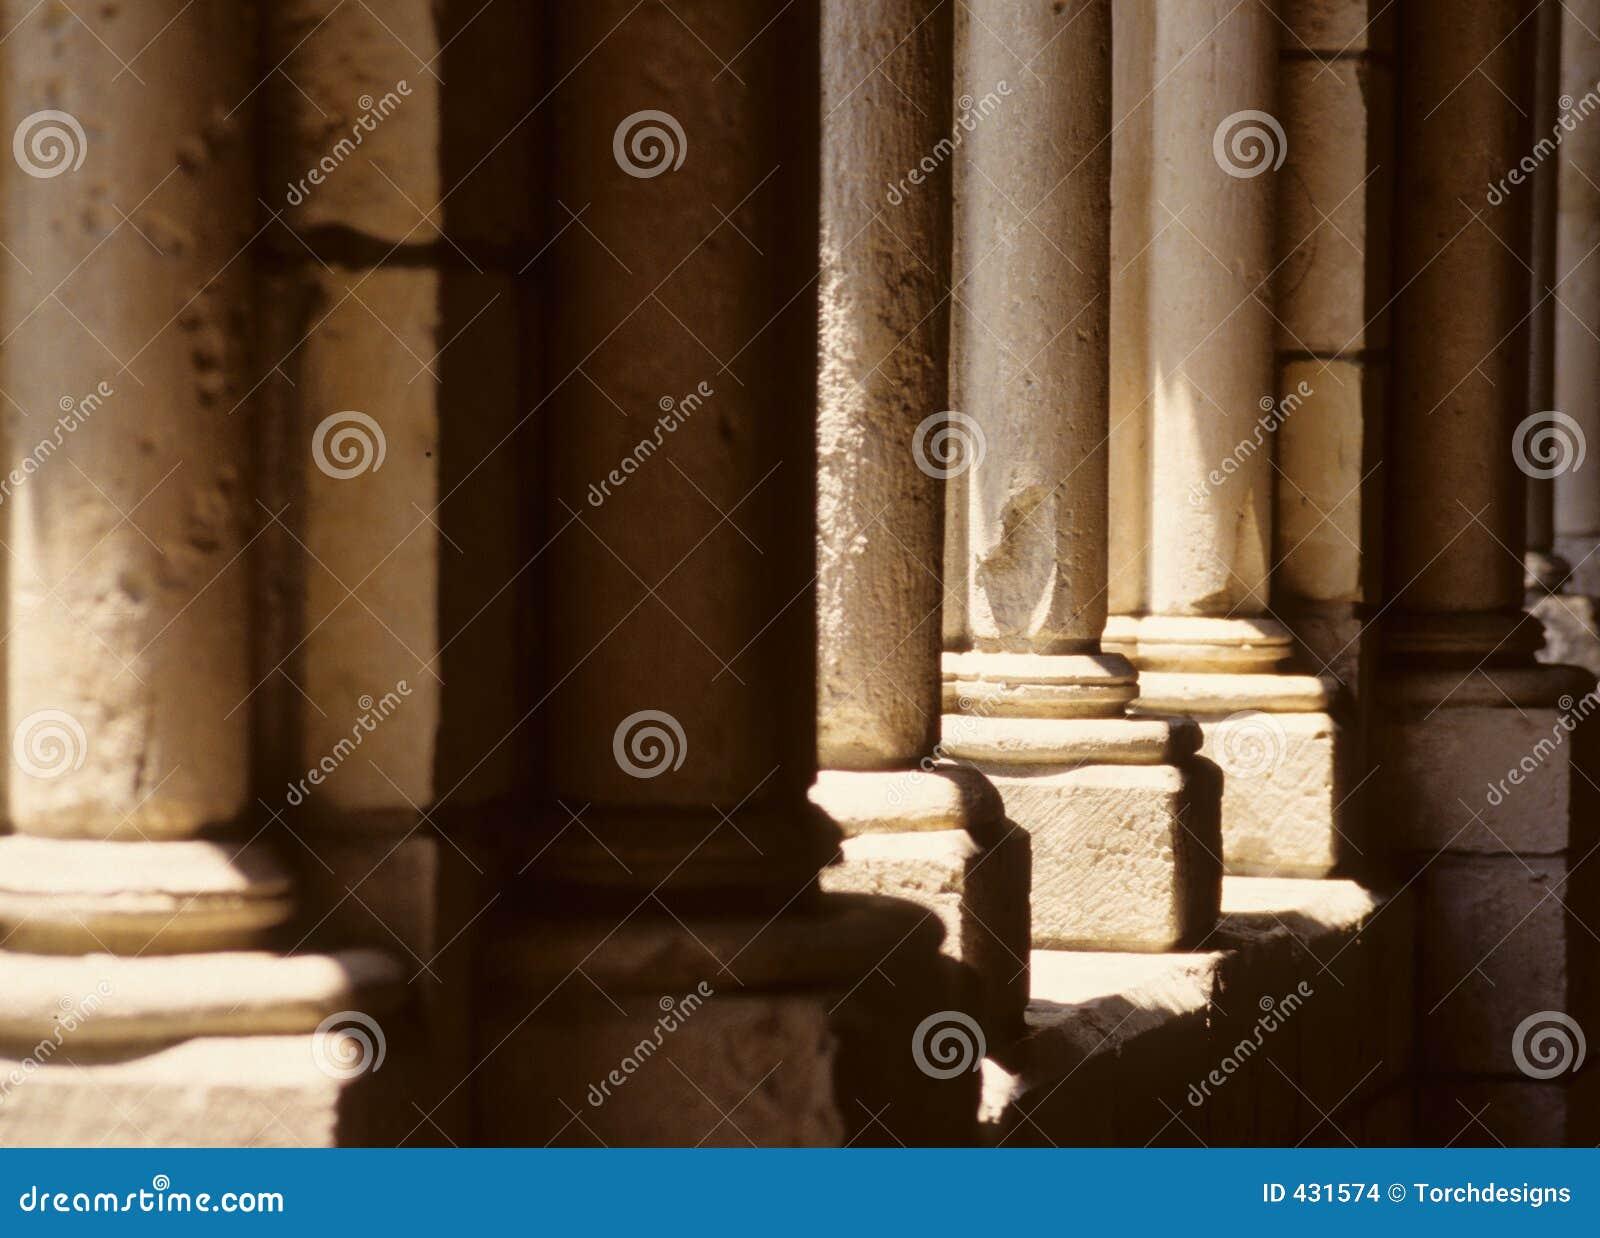 Old Stone Pillars : Old stone pillars stock photo image of historical